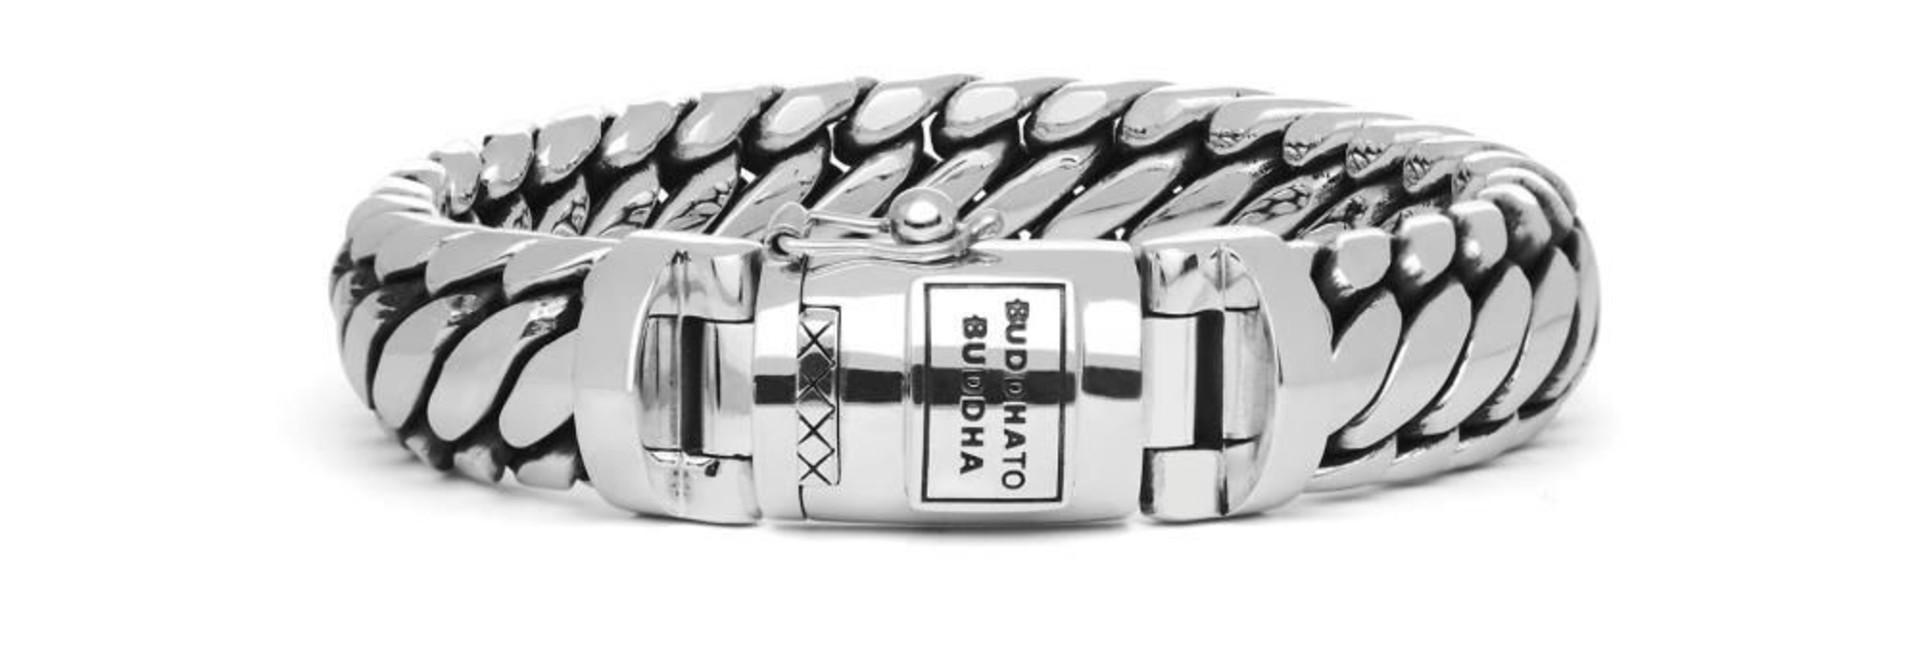 Ben Medium Bracelet